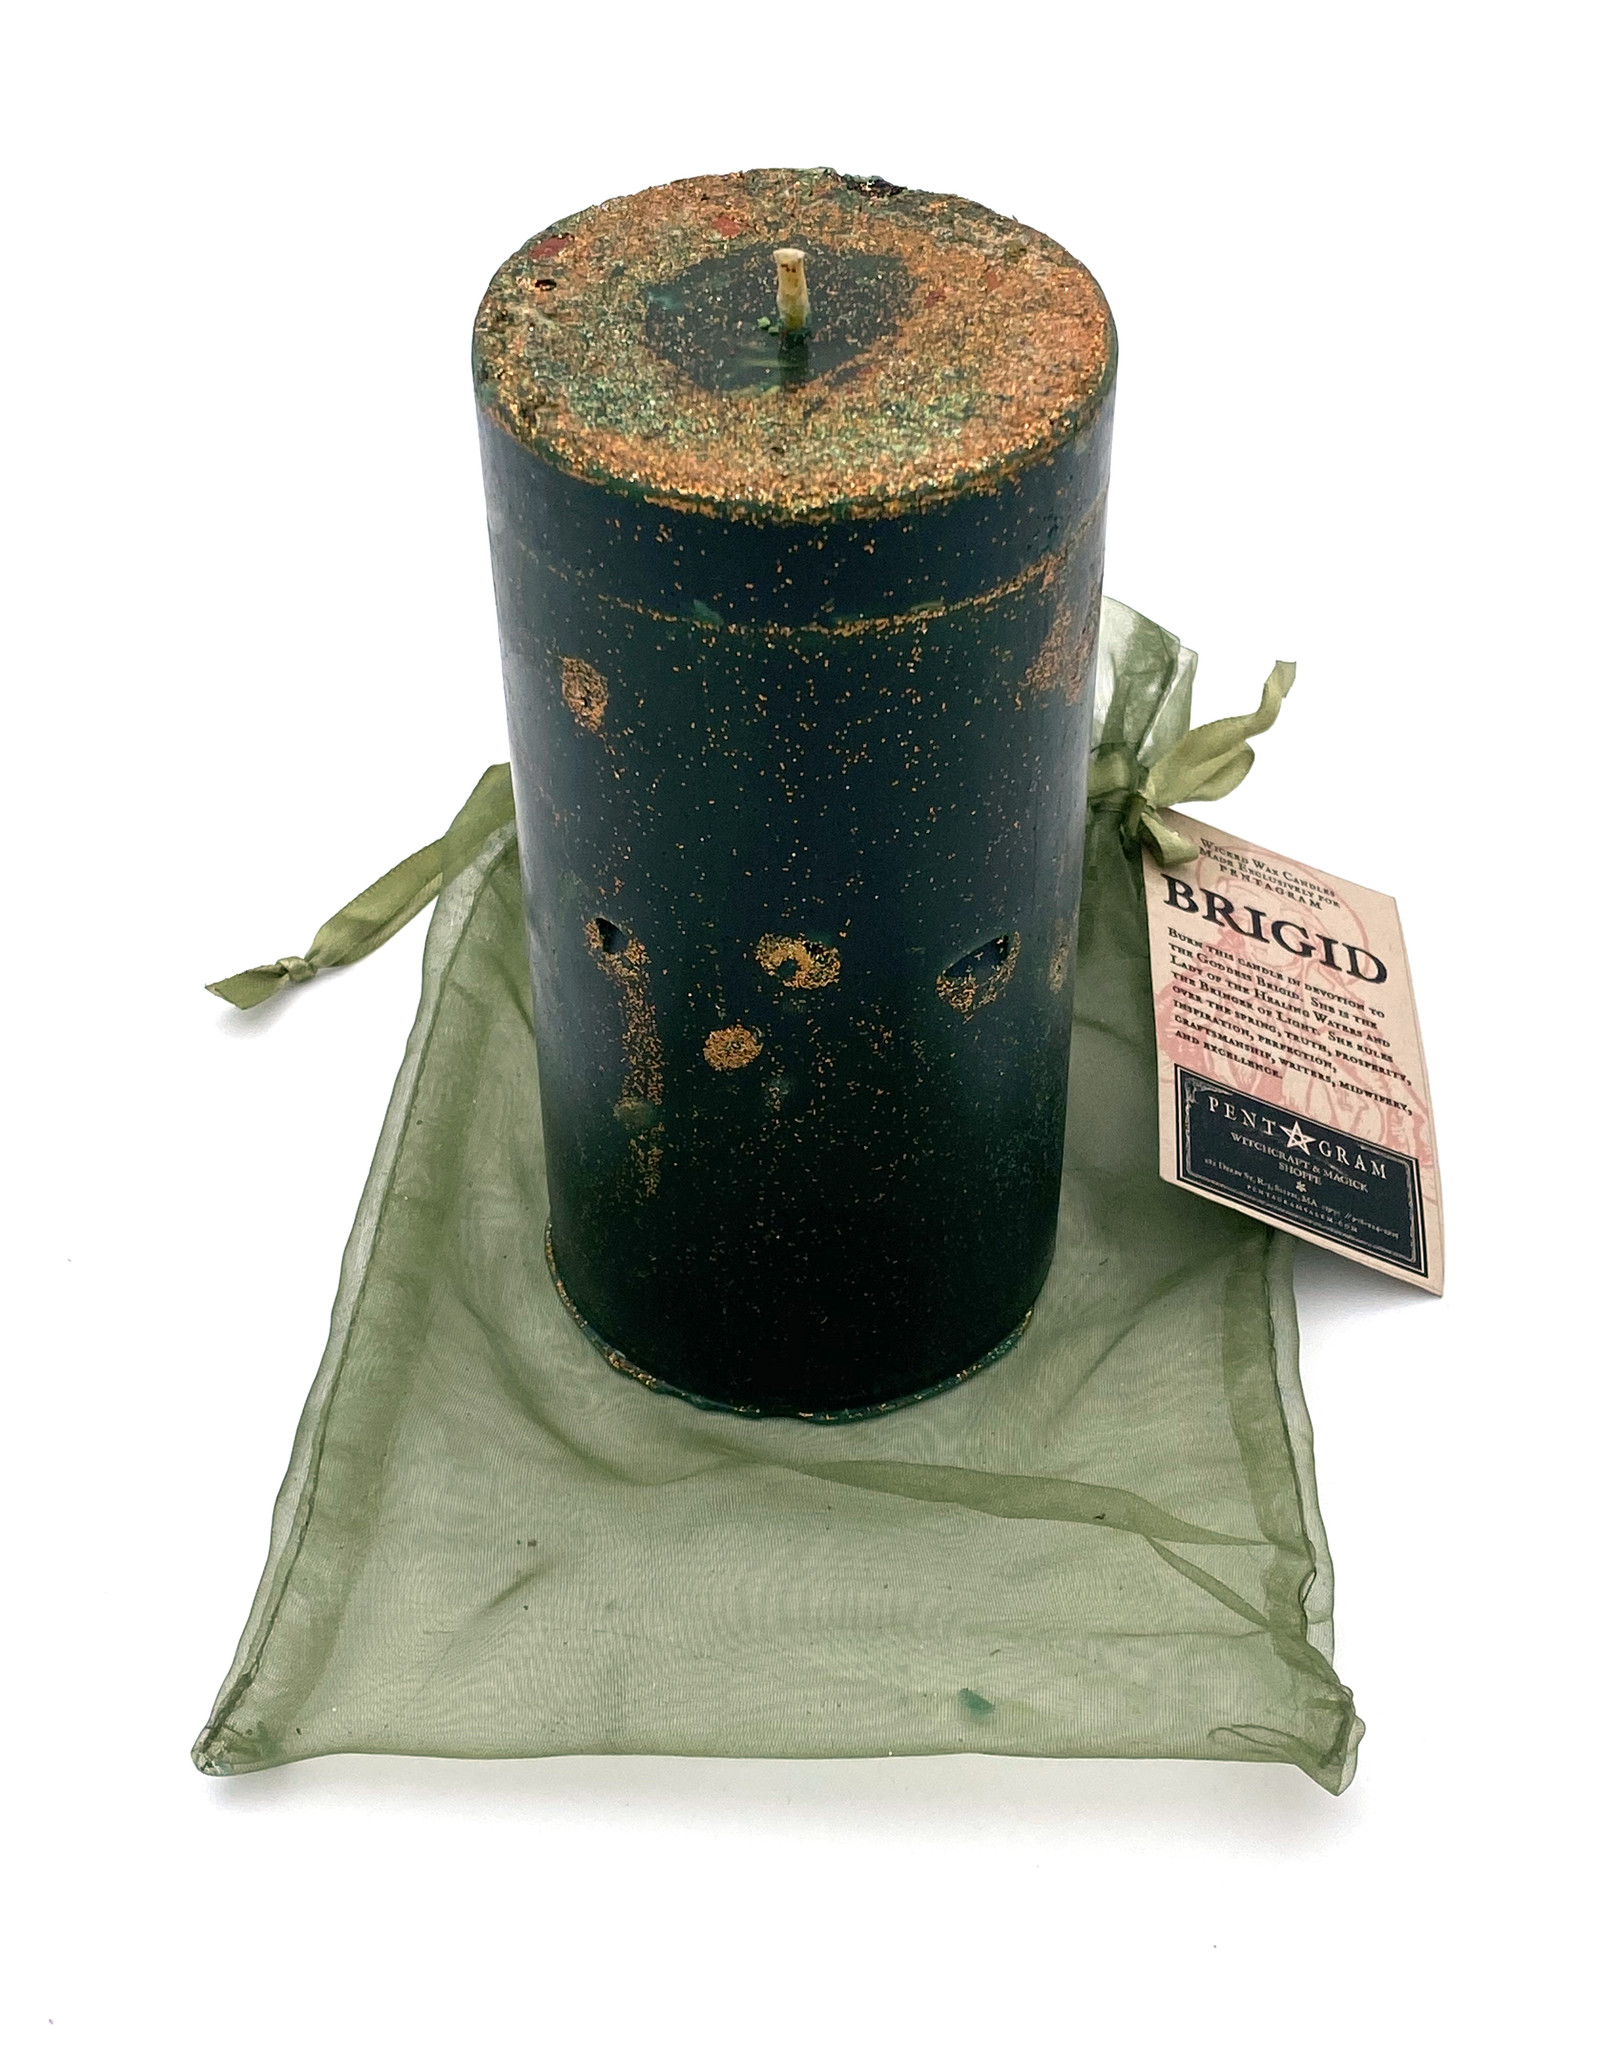 Brigid Handmade Candle